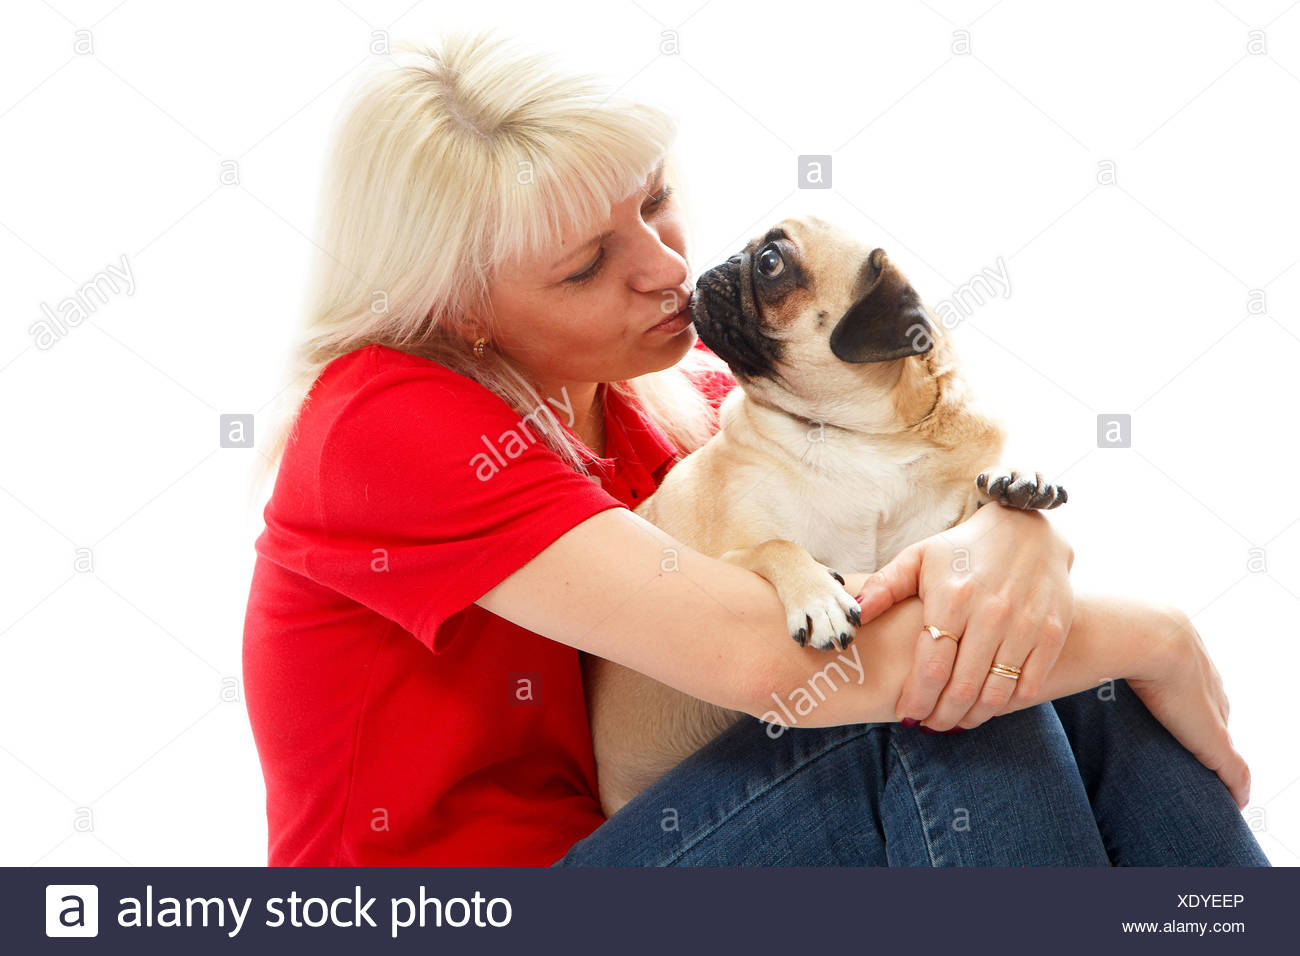 oman kissing a pug Stock Photo